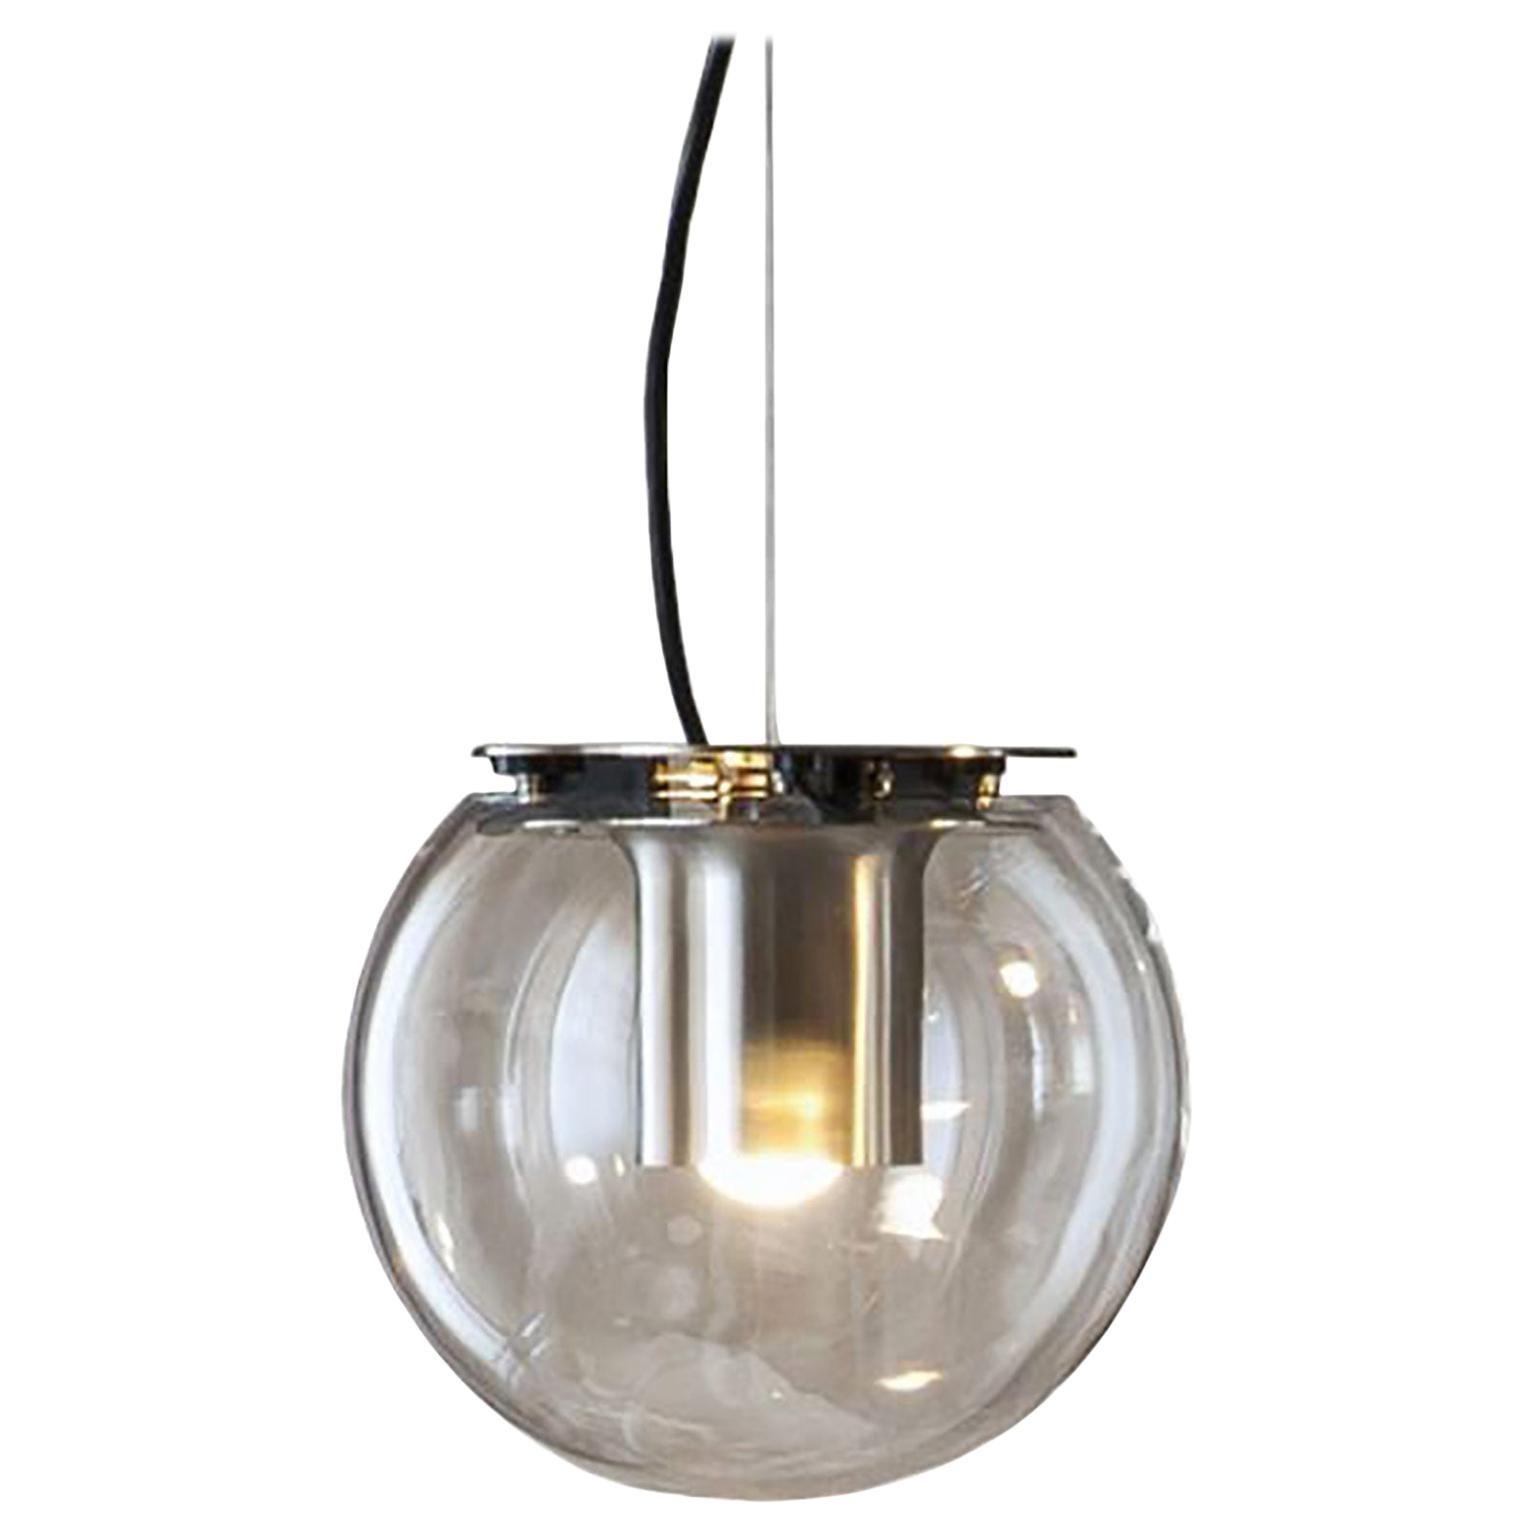 Globe Suspension Lamp by Joe Colombo for Oluce